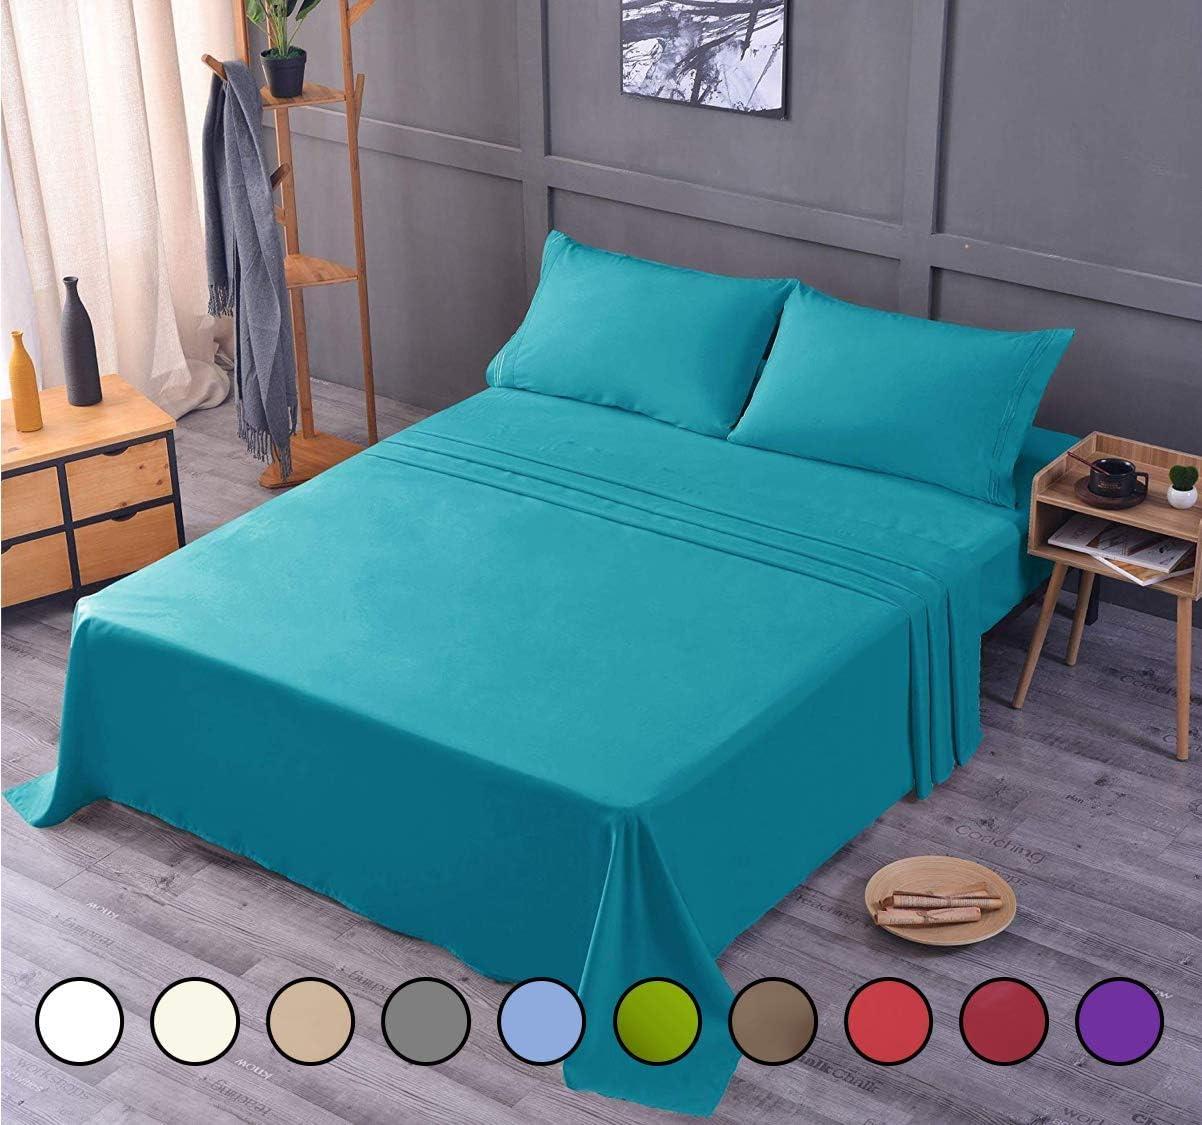 Bamboo Ultra Soft Luxury Sheet Set – Deep Pocket, Machine Washable, Wrinkle and Shrink Resistant, Hypoallergenic, Cooling, Fade Resistant Bedding Sheet – 5 Piece Set (Split King, Teal)